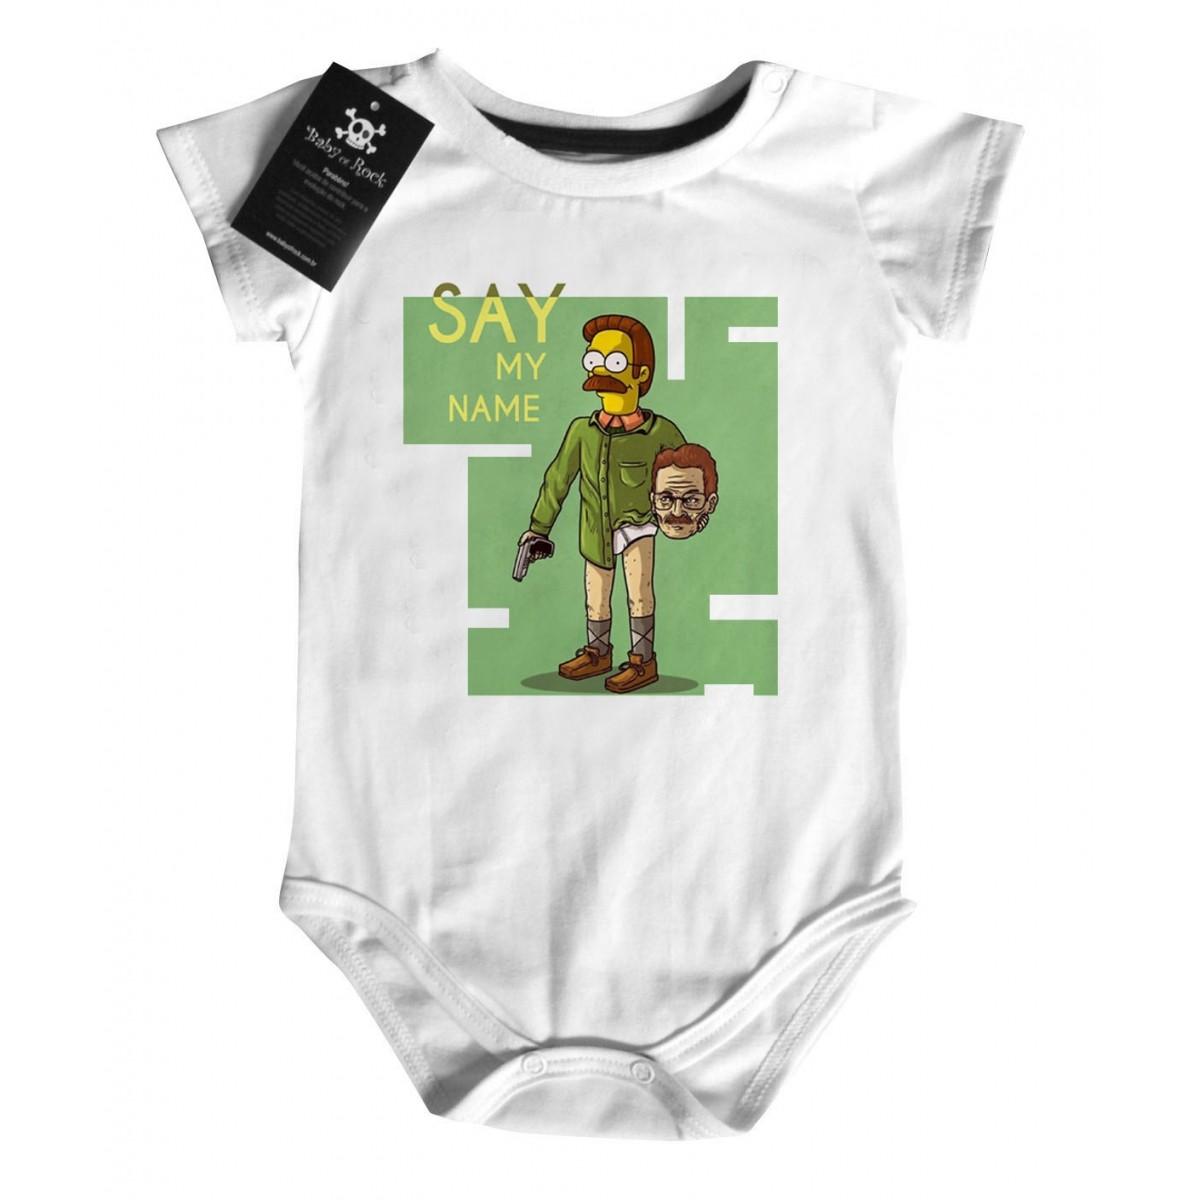 Camiseta Bebê Say my Name -  Simpsons - White  - Baby Monster - Body Bebe